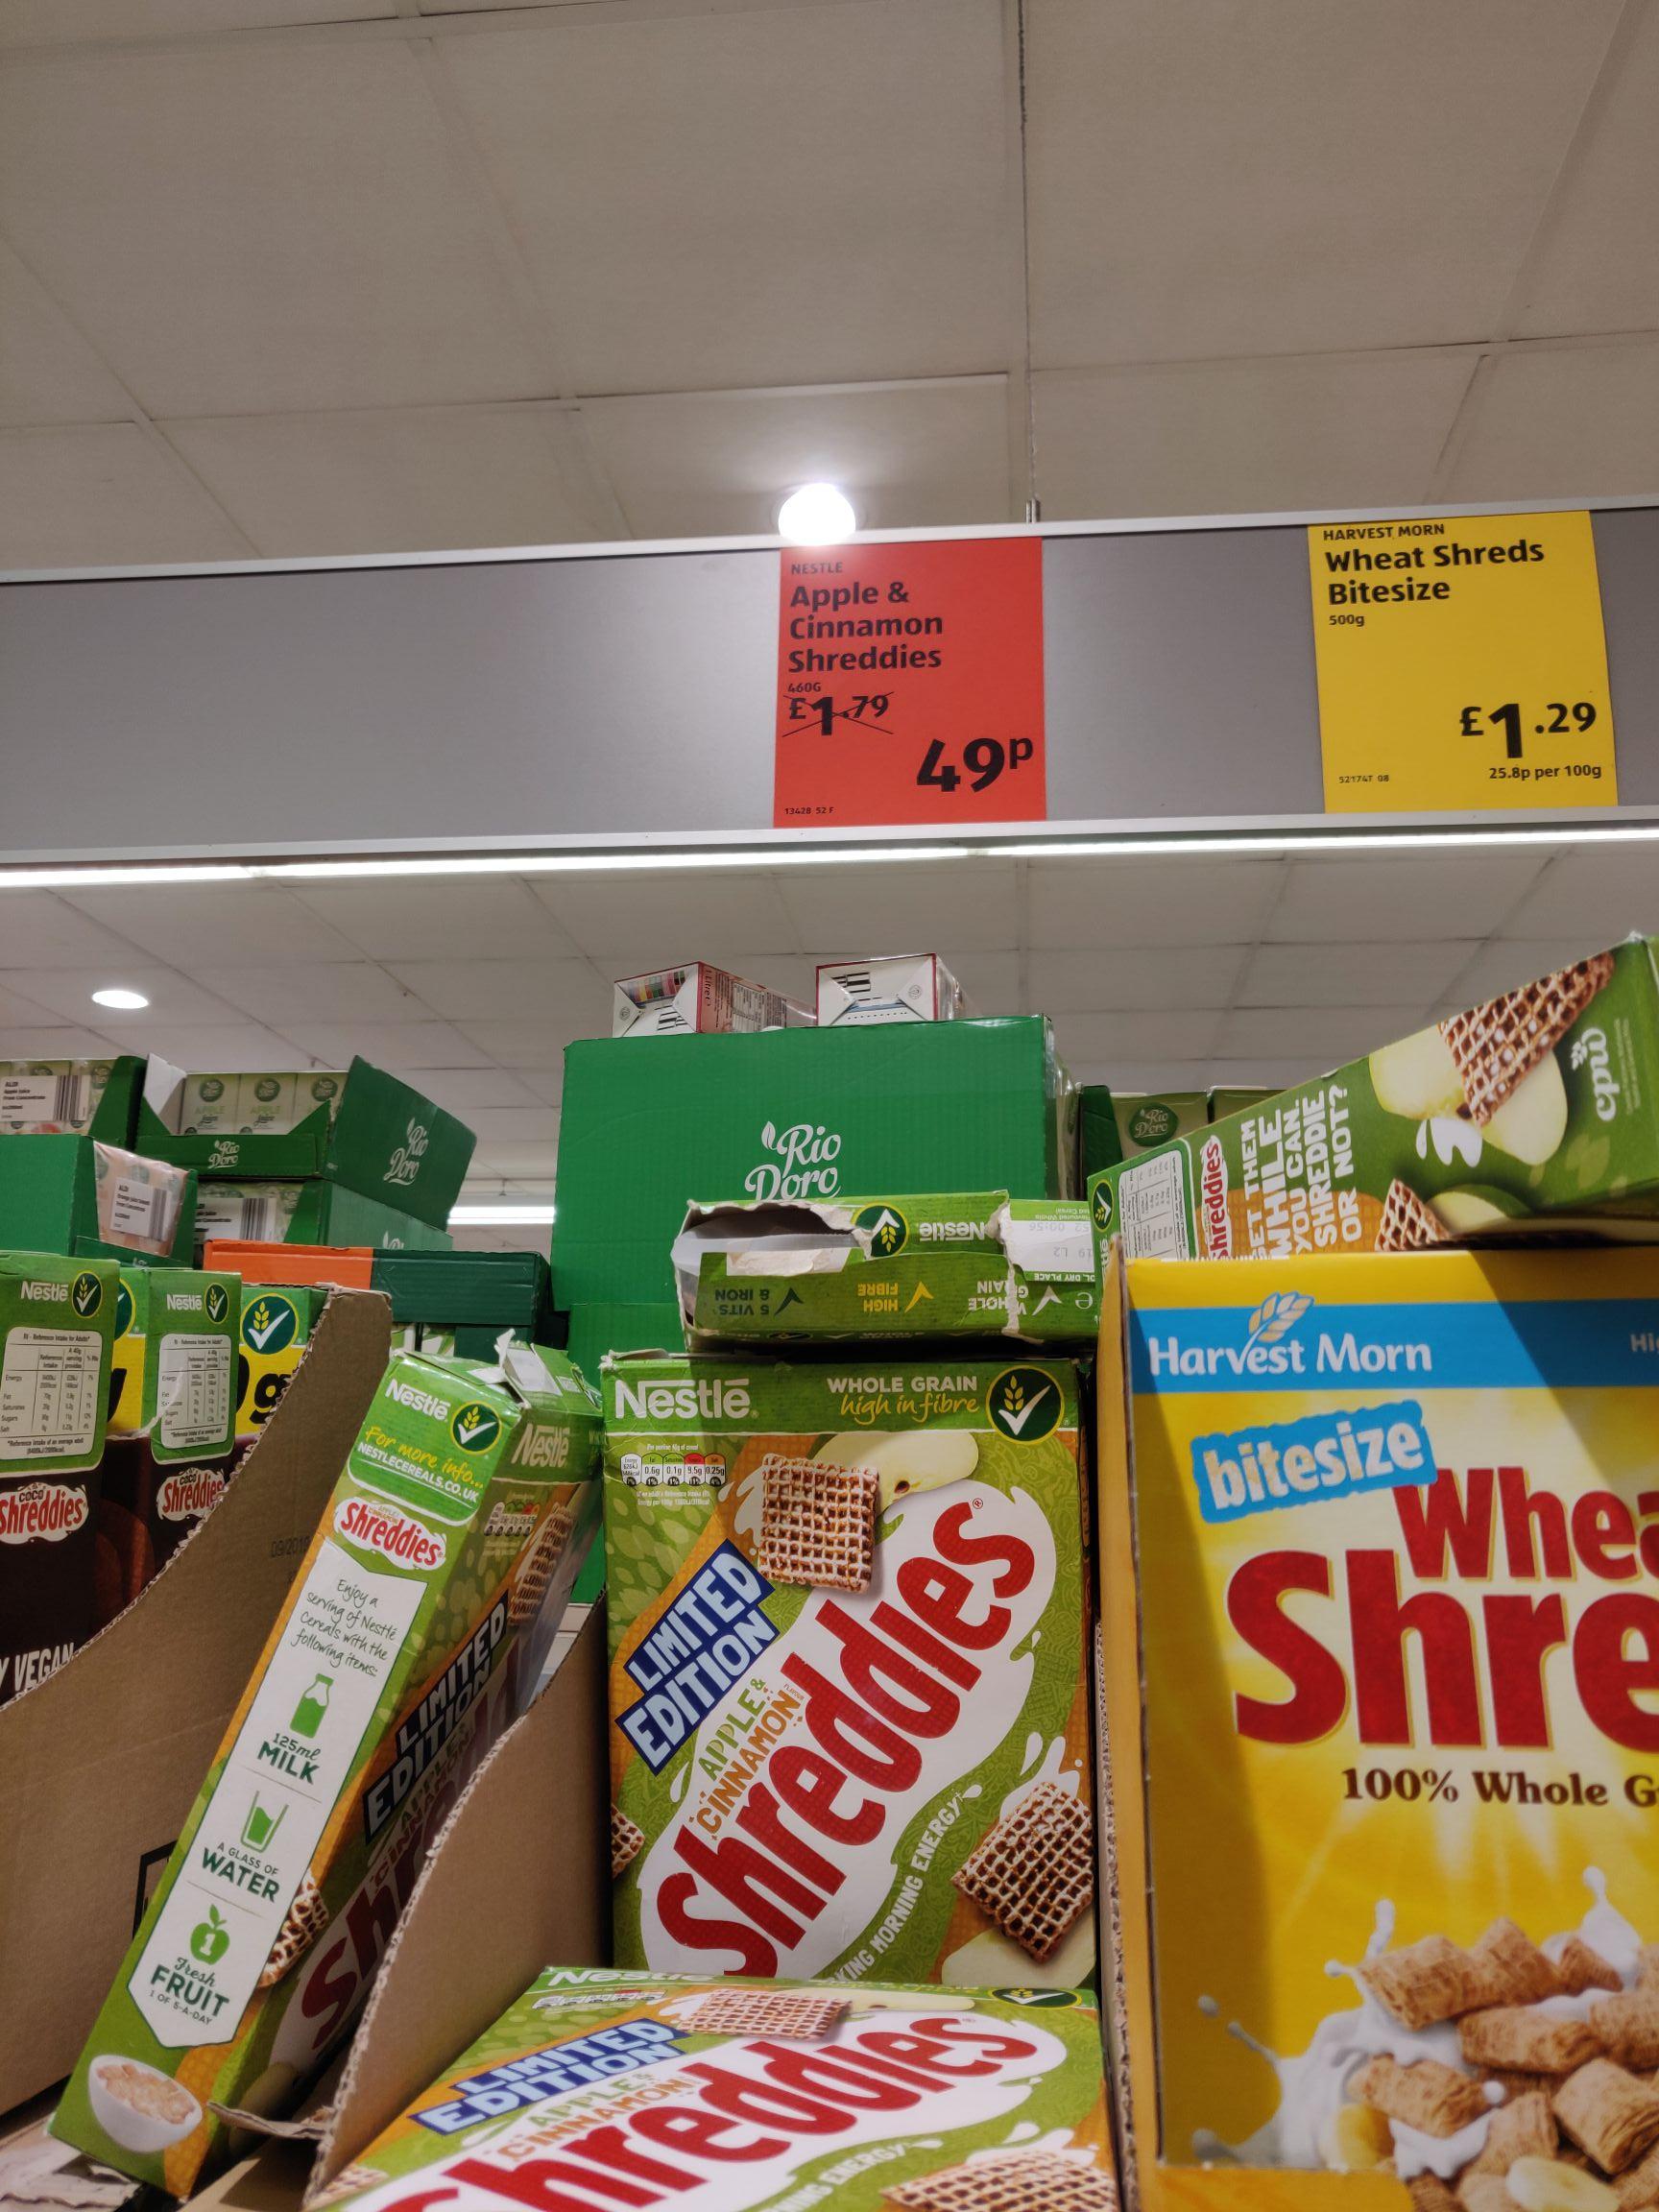 Apple and Cinnamon Shreddies - 49p @ ALDI (Sparkhill)